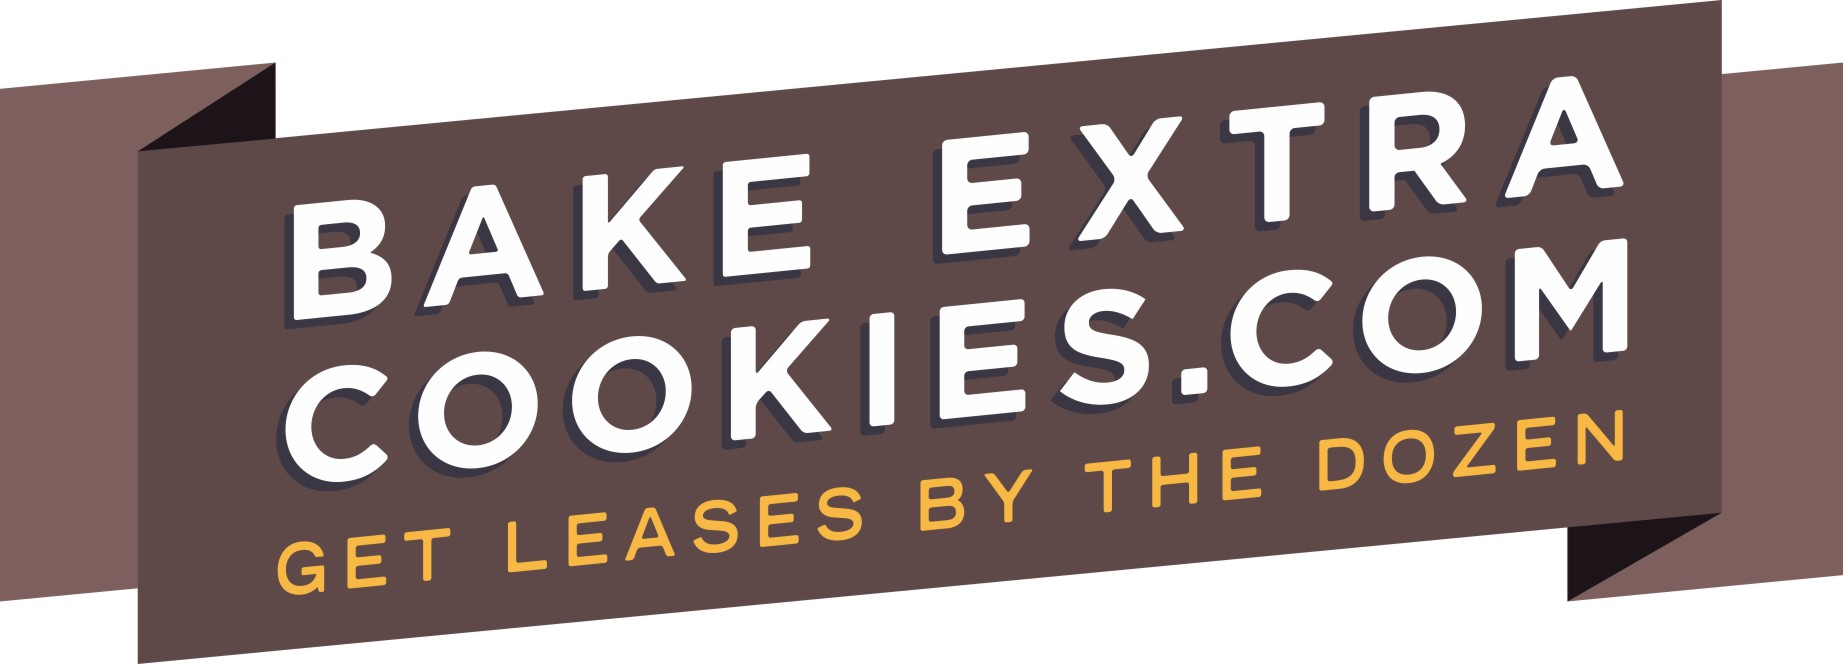 BakeExtraCookies Logo Vector File